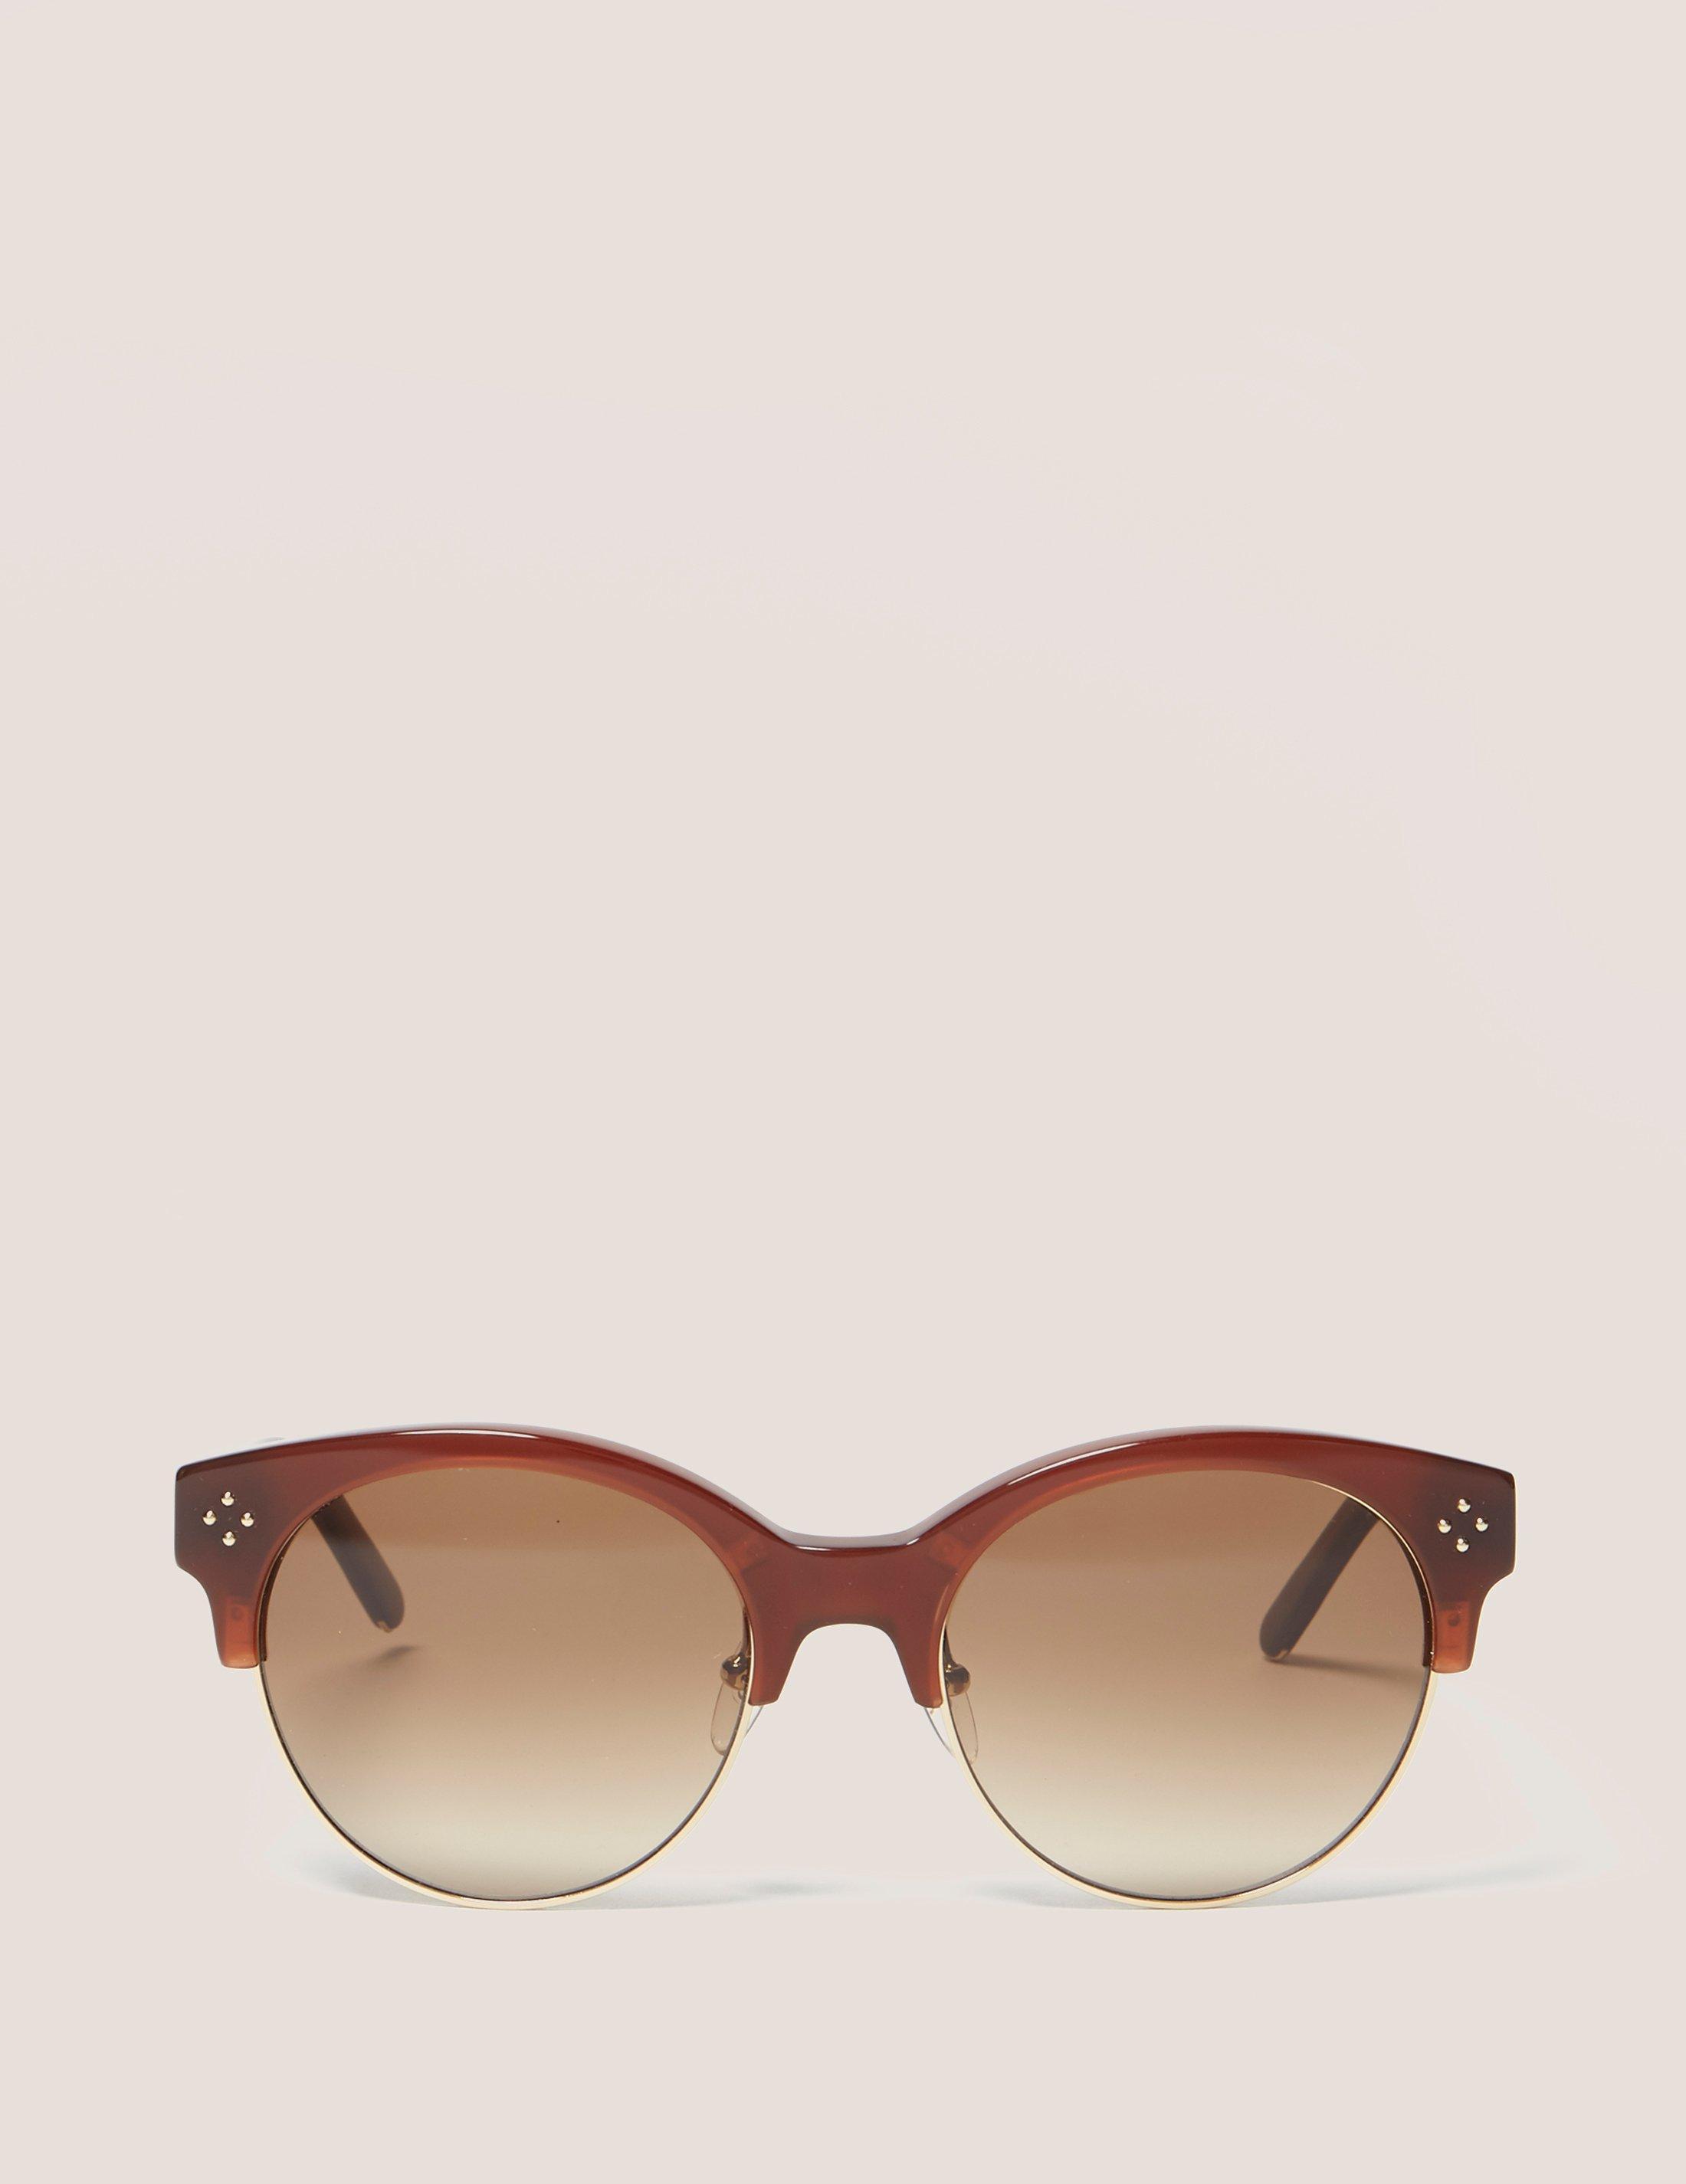 0722eaf2393 Chloé Boxwood Sunglasses in Brown - Lyst